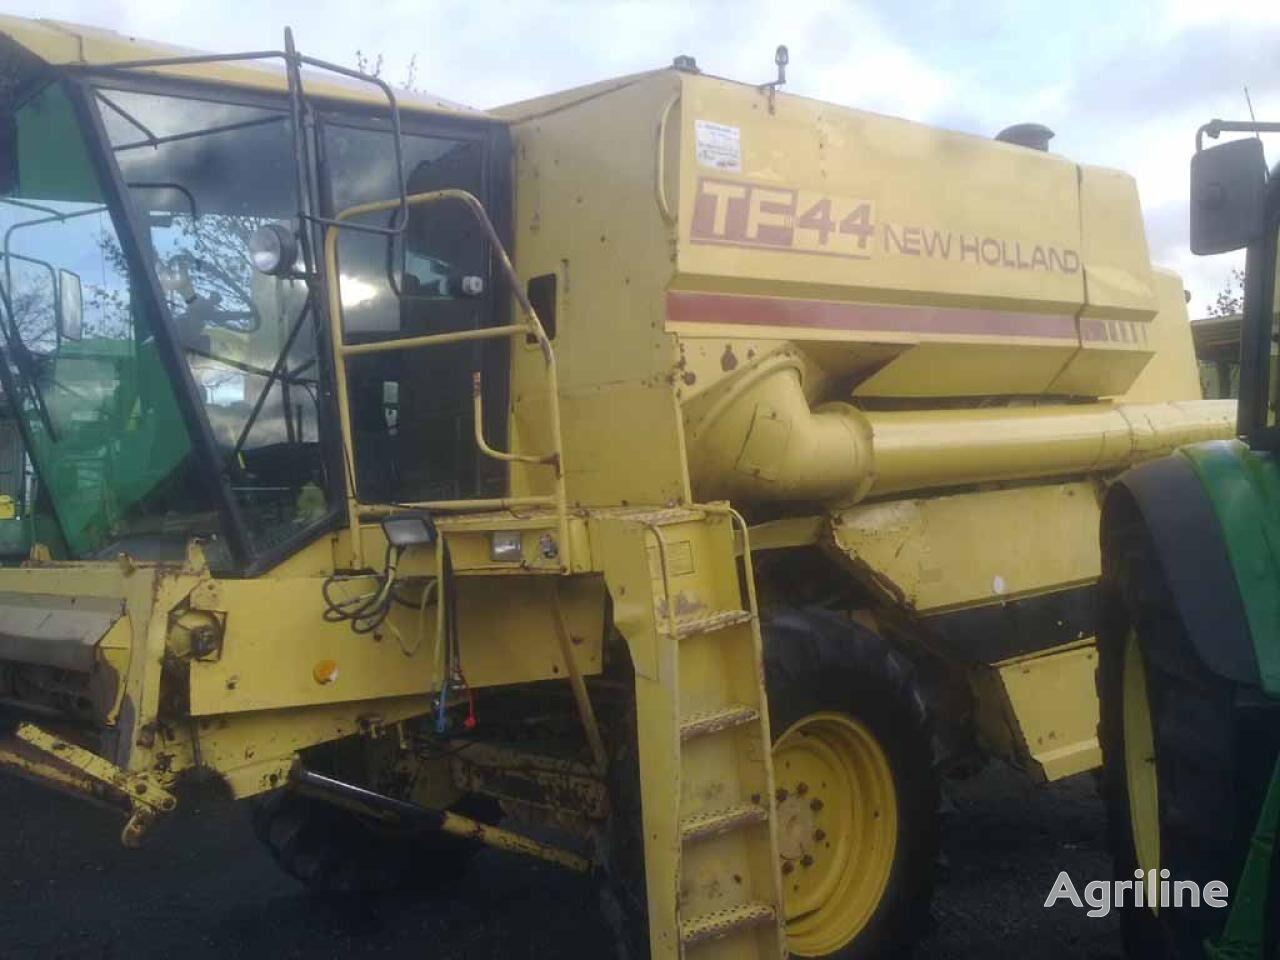 NEW HOLLAND TF 44 grain harvester